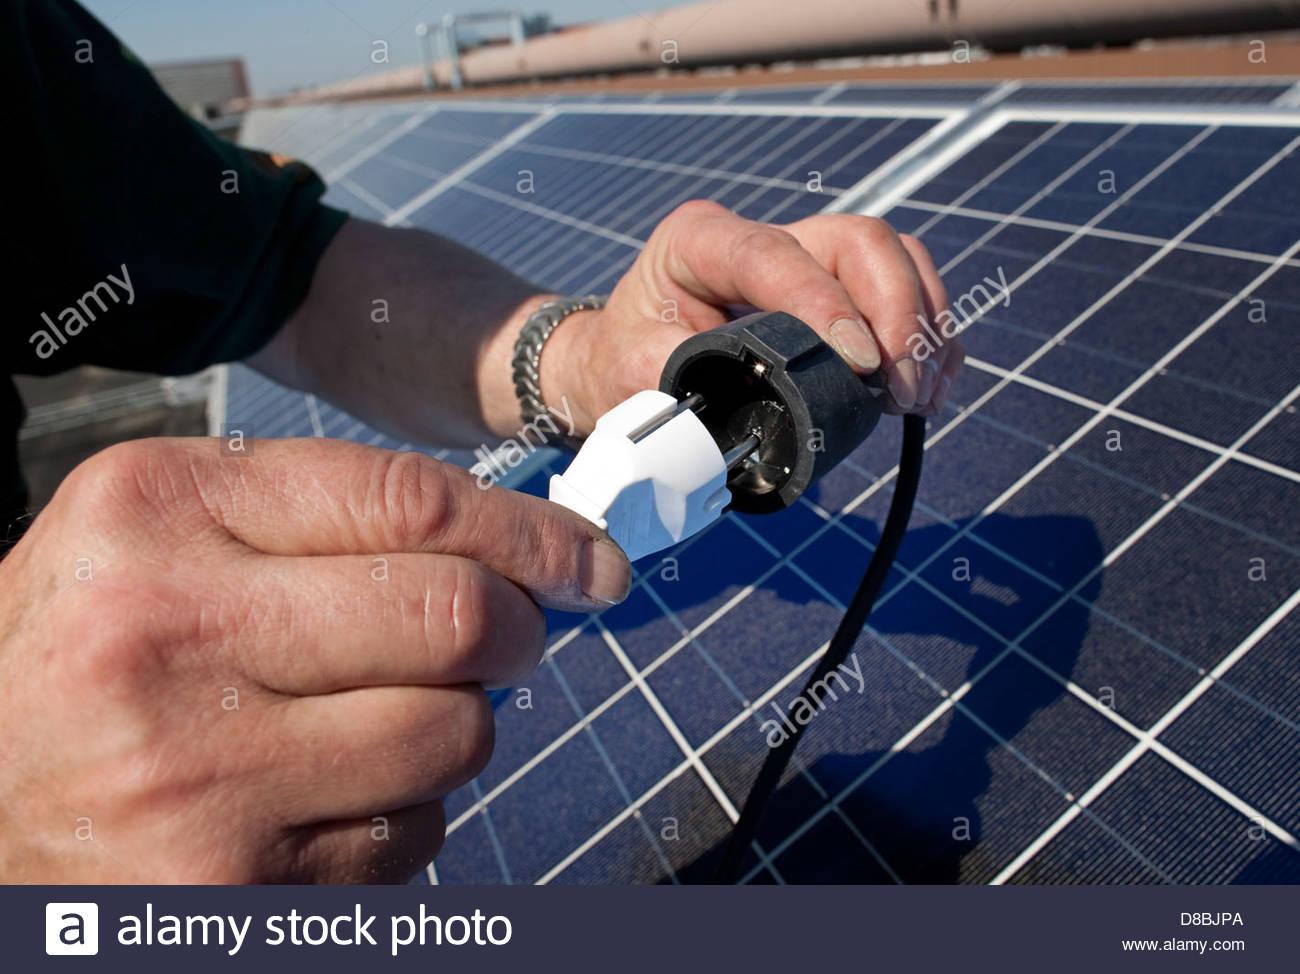 Technician connecting electric plugs near solar panel - Stock Image